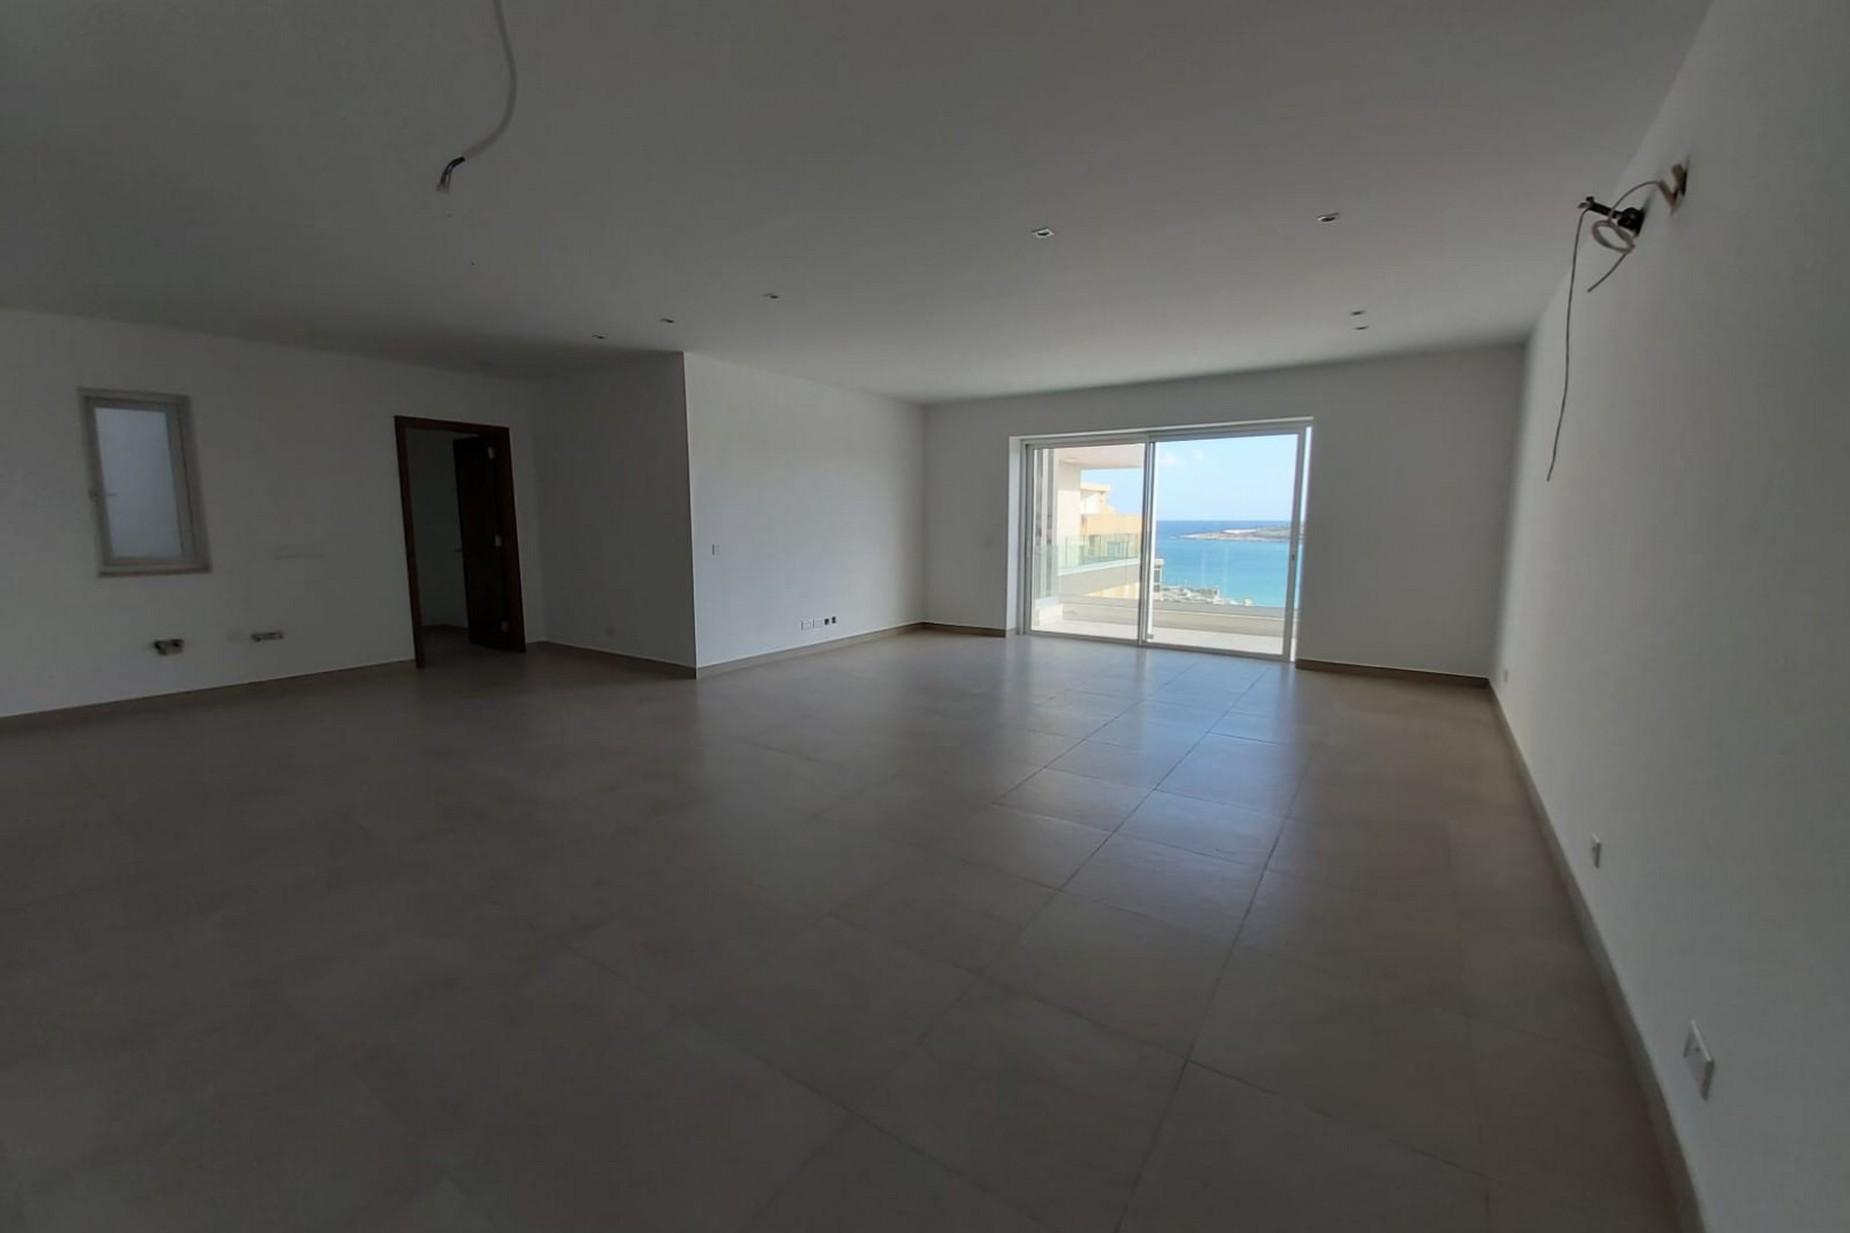 3 bed Apartment For Sale in Qawra, Qawra - thumb 2